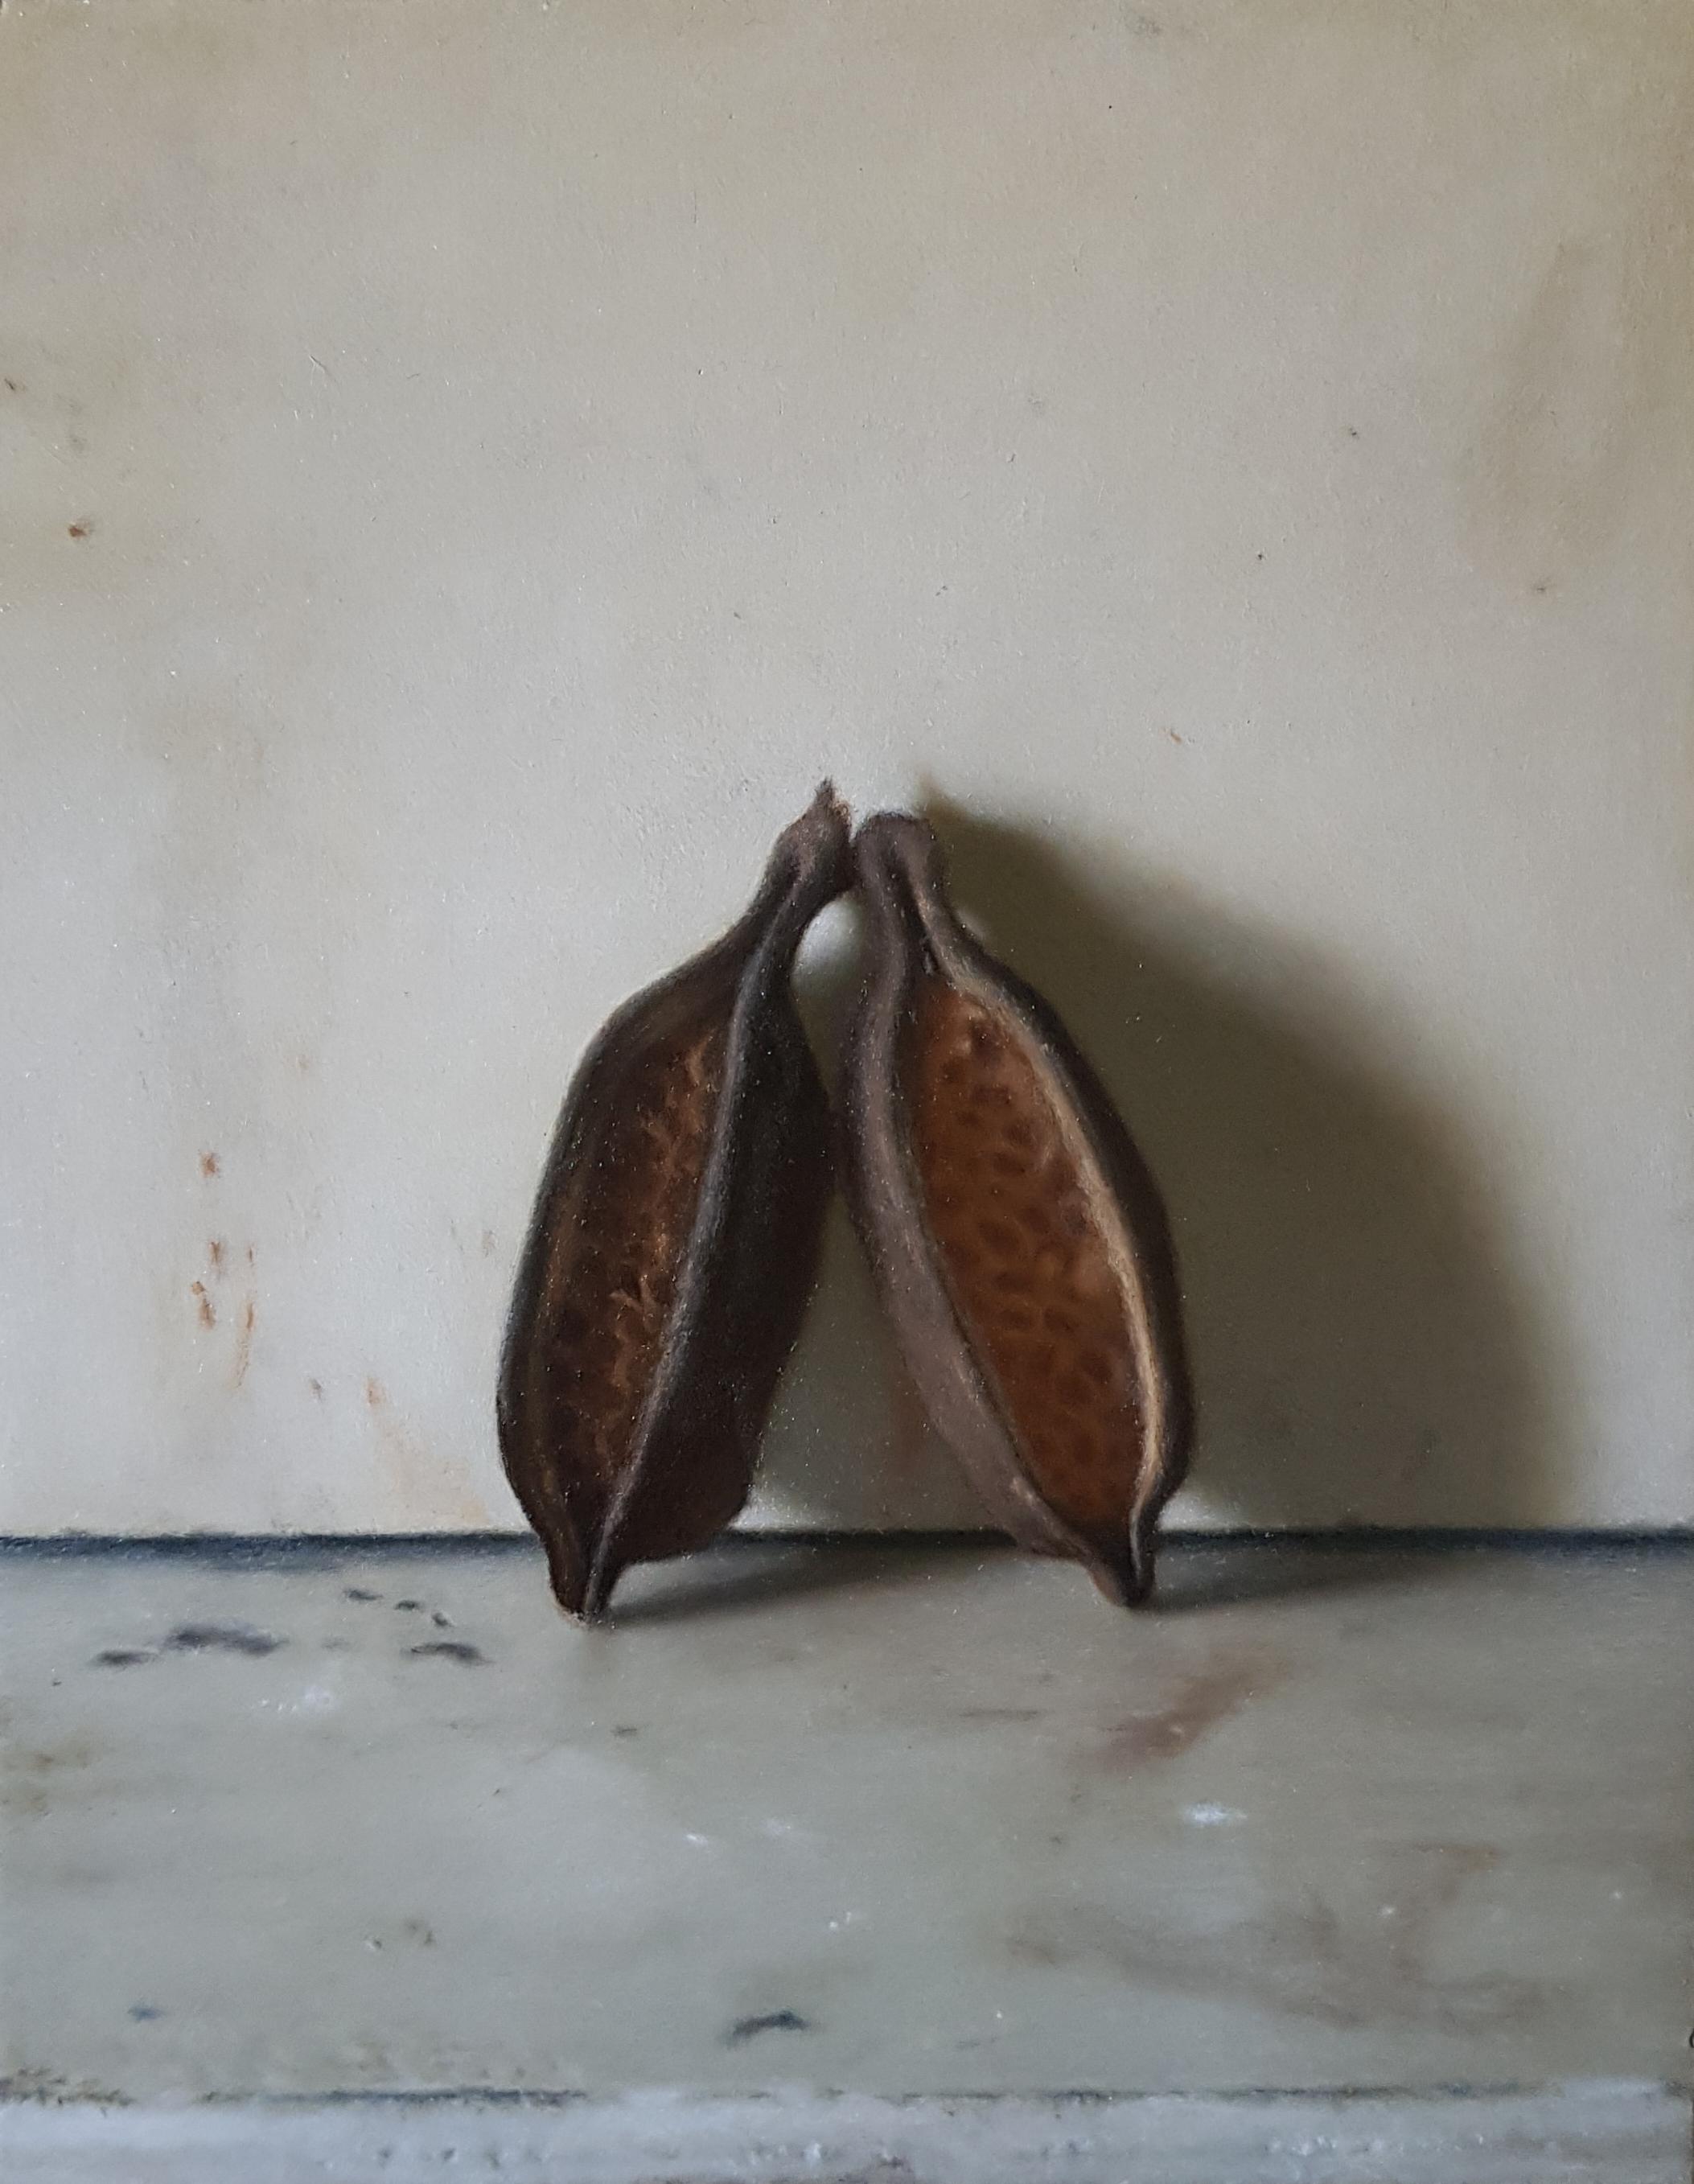 Brachychiton seed pods